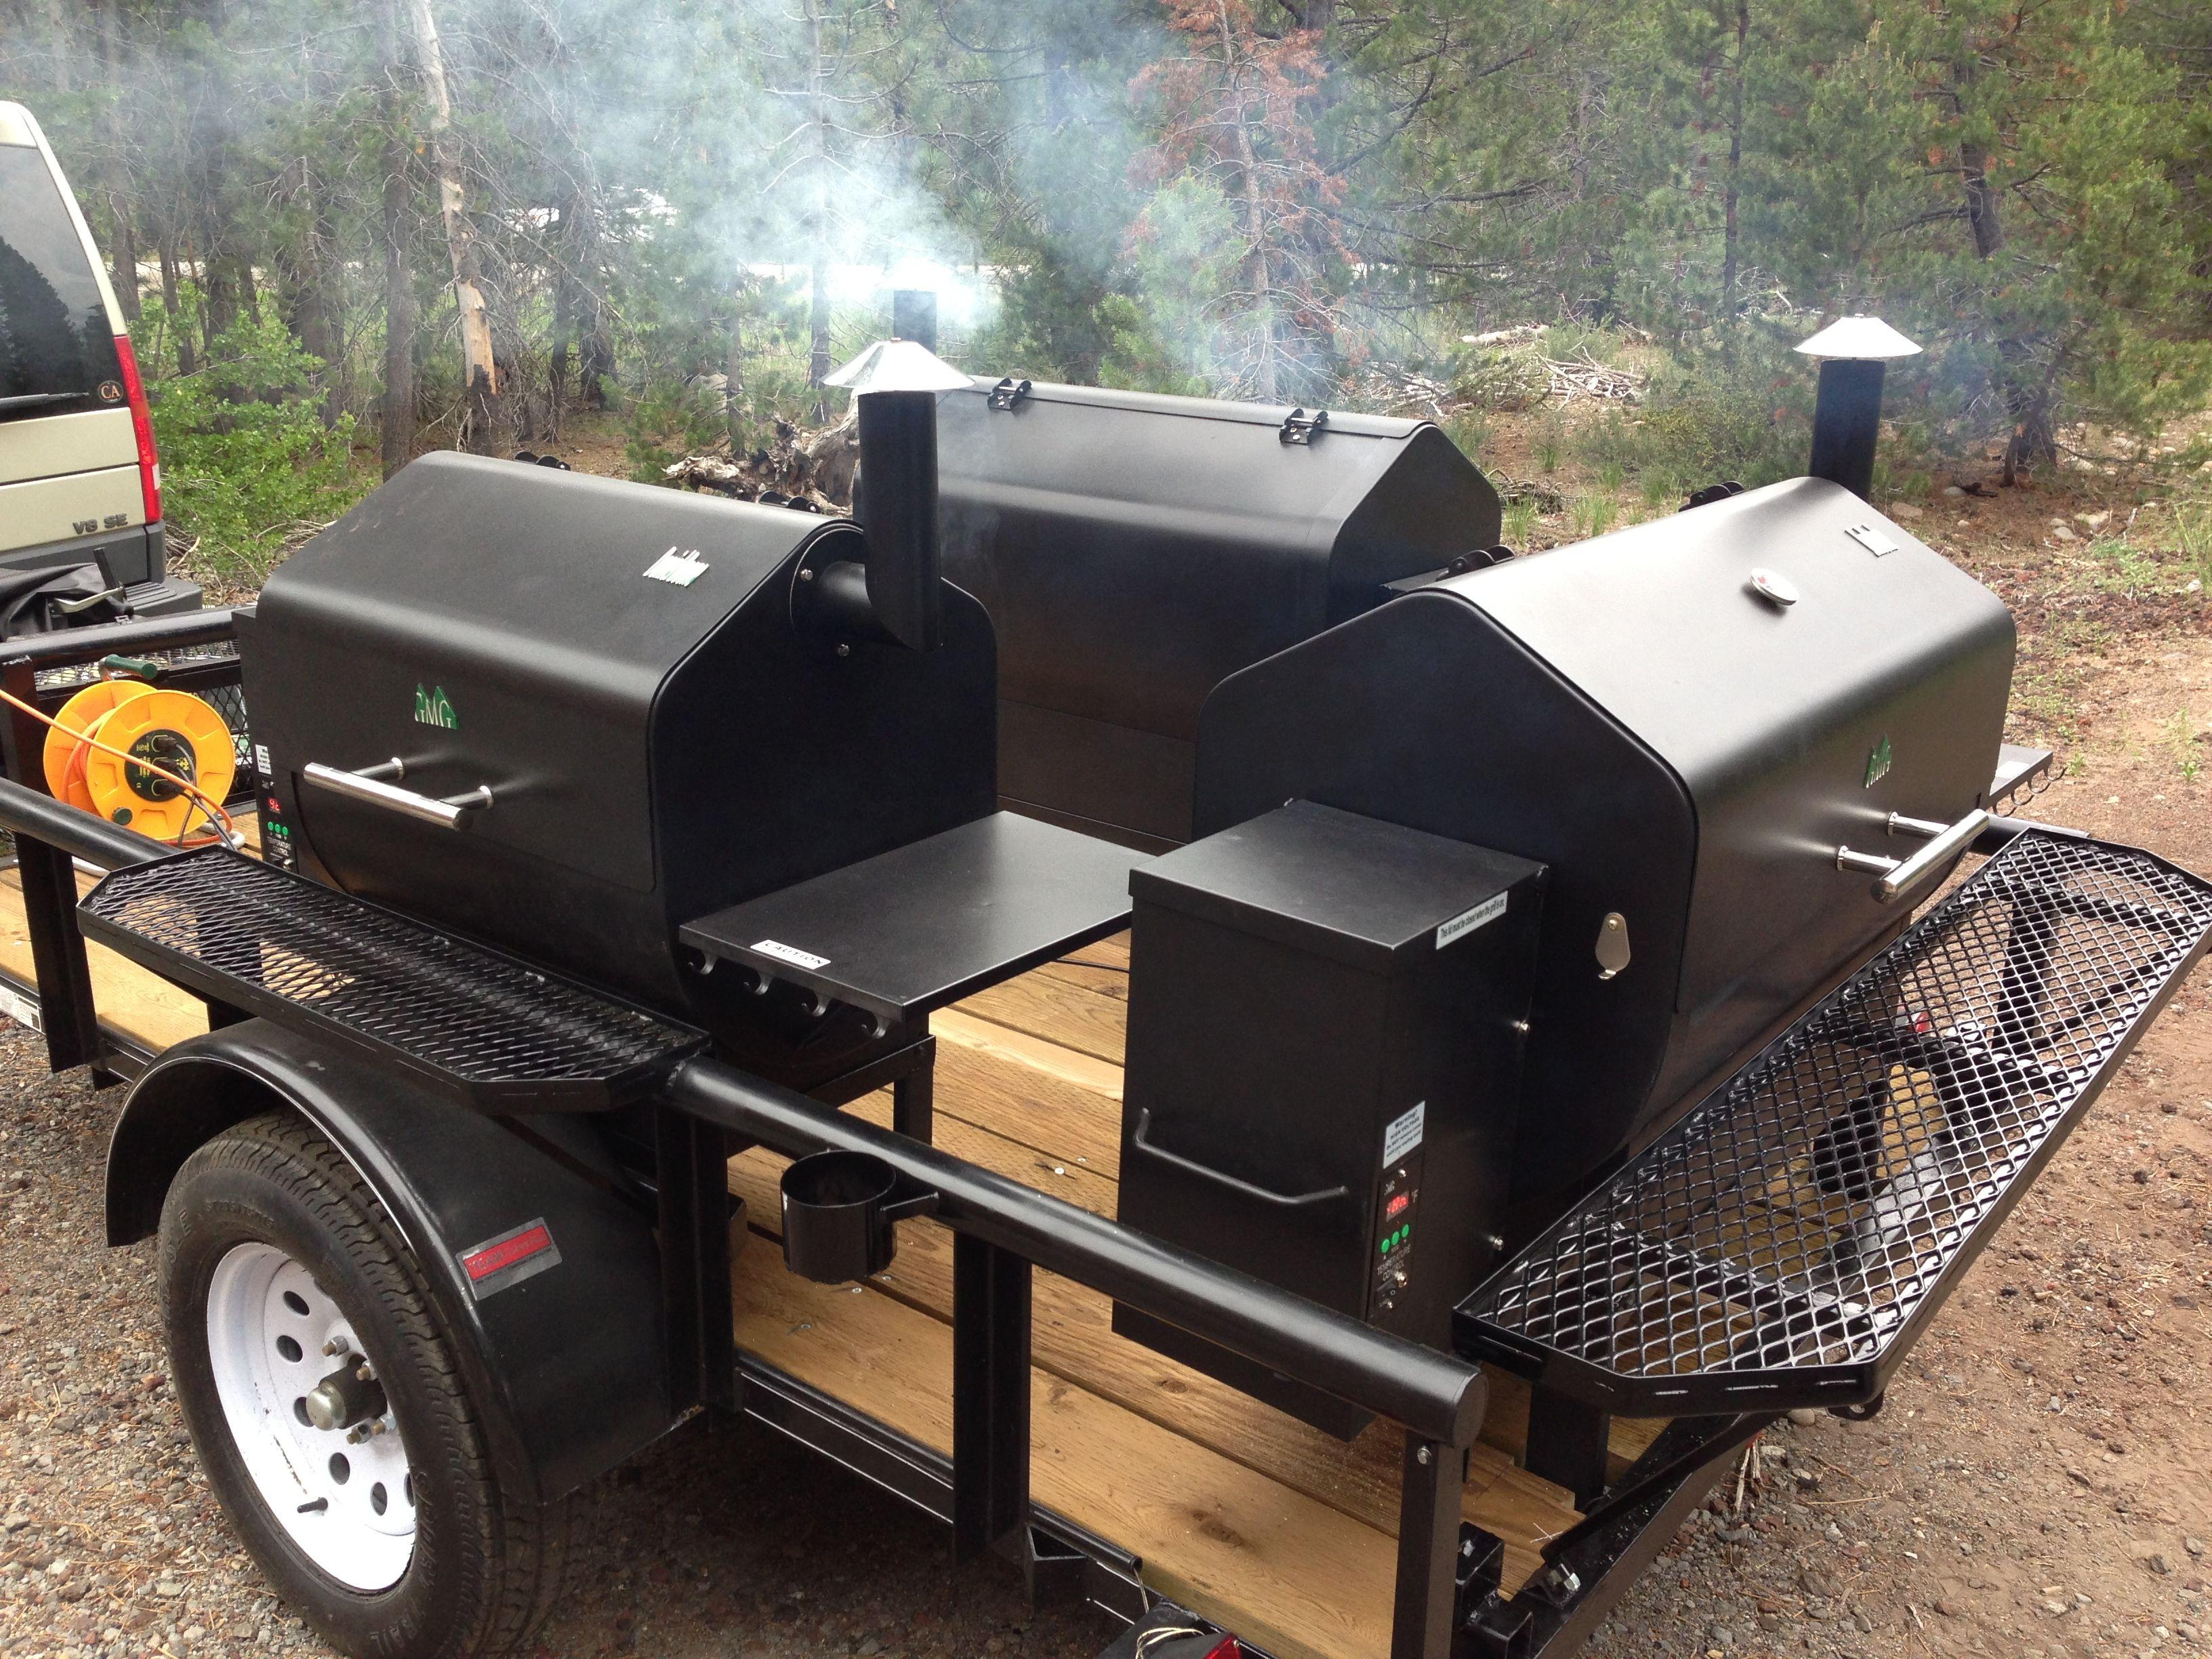 Tahoe pellet grills and big blue q s new bbq trailer